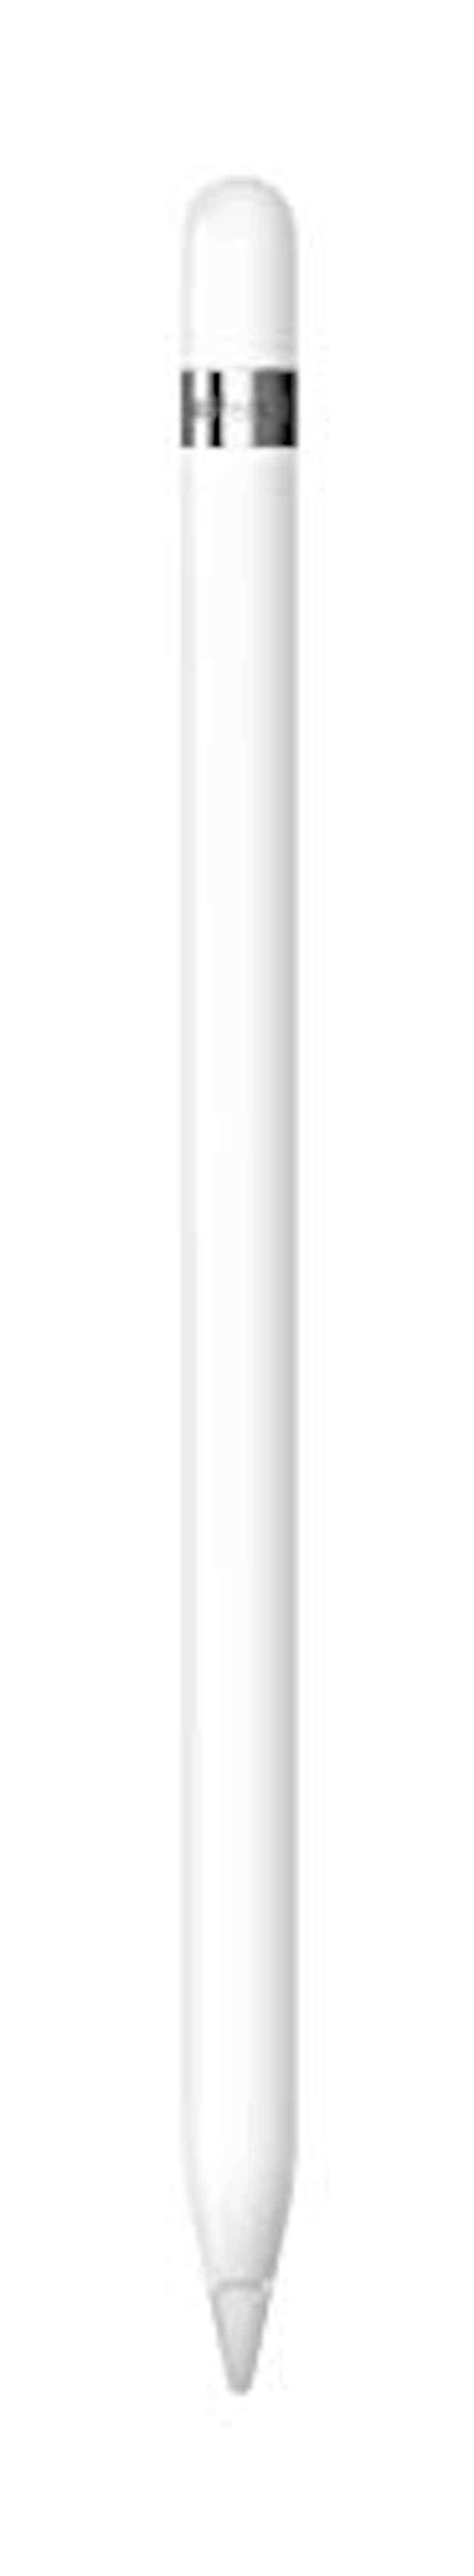 Apple(アップル),Apple Pencil,MK0C2J/A